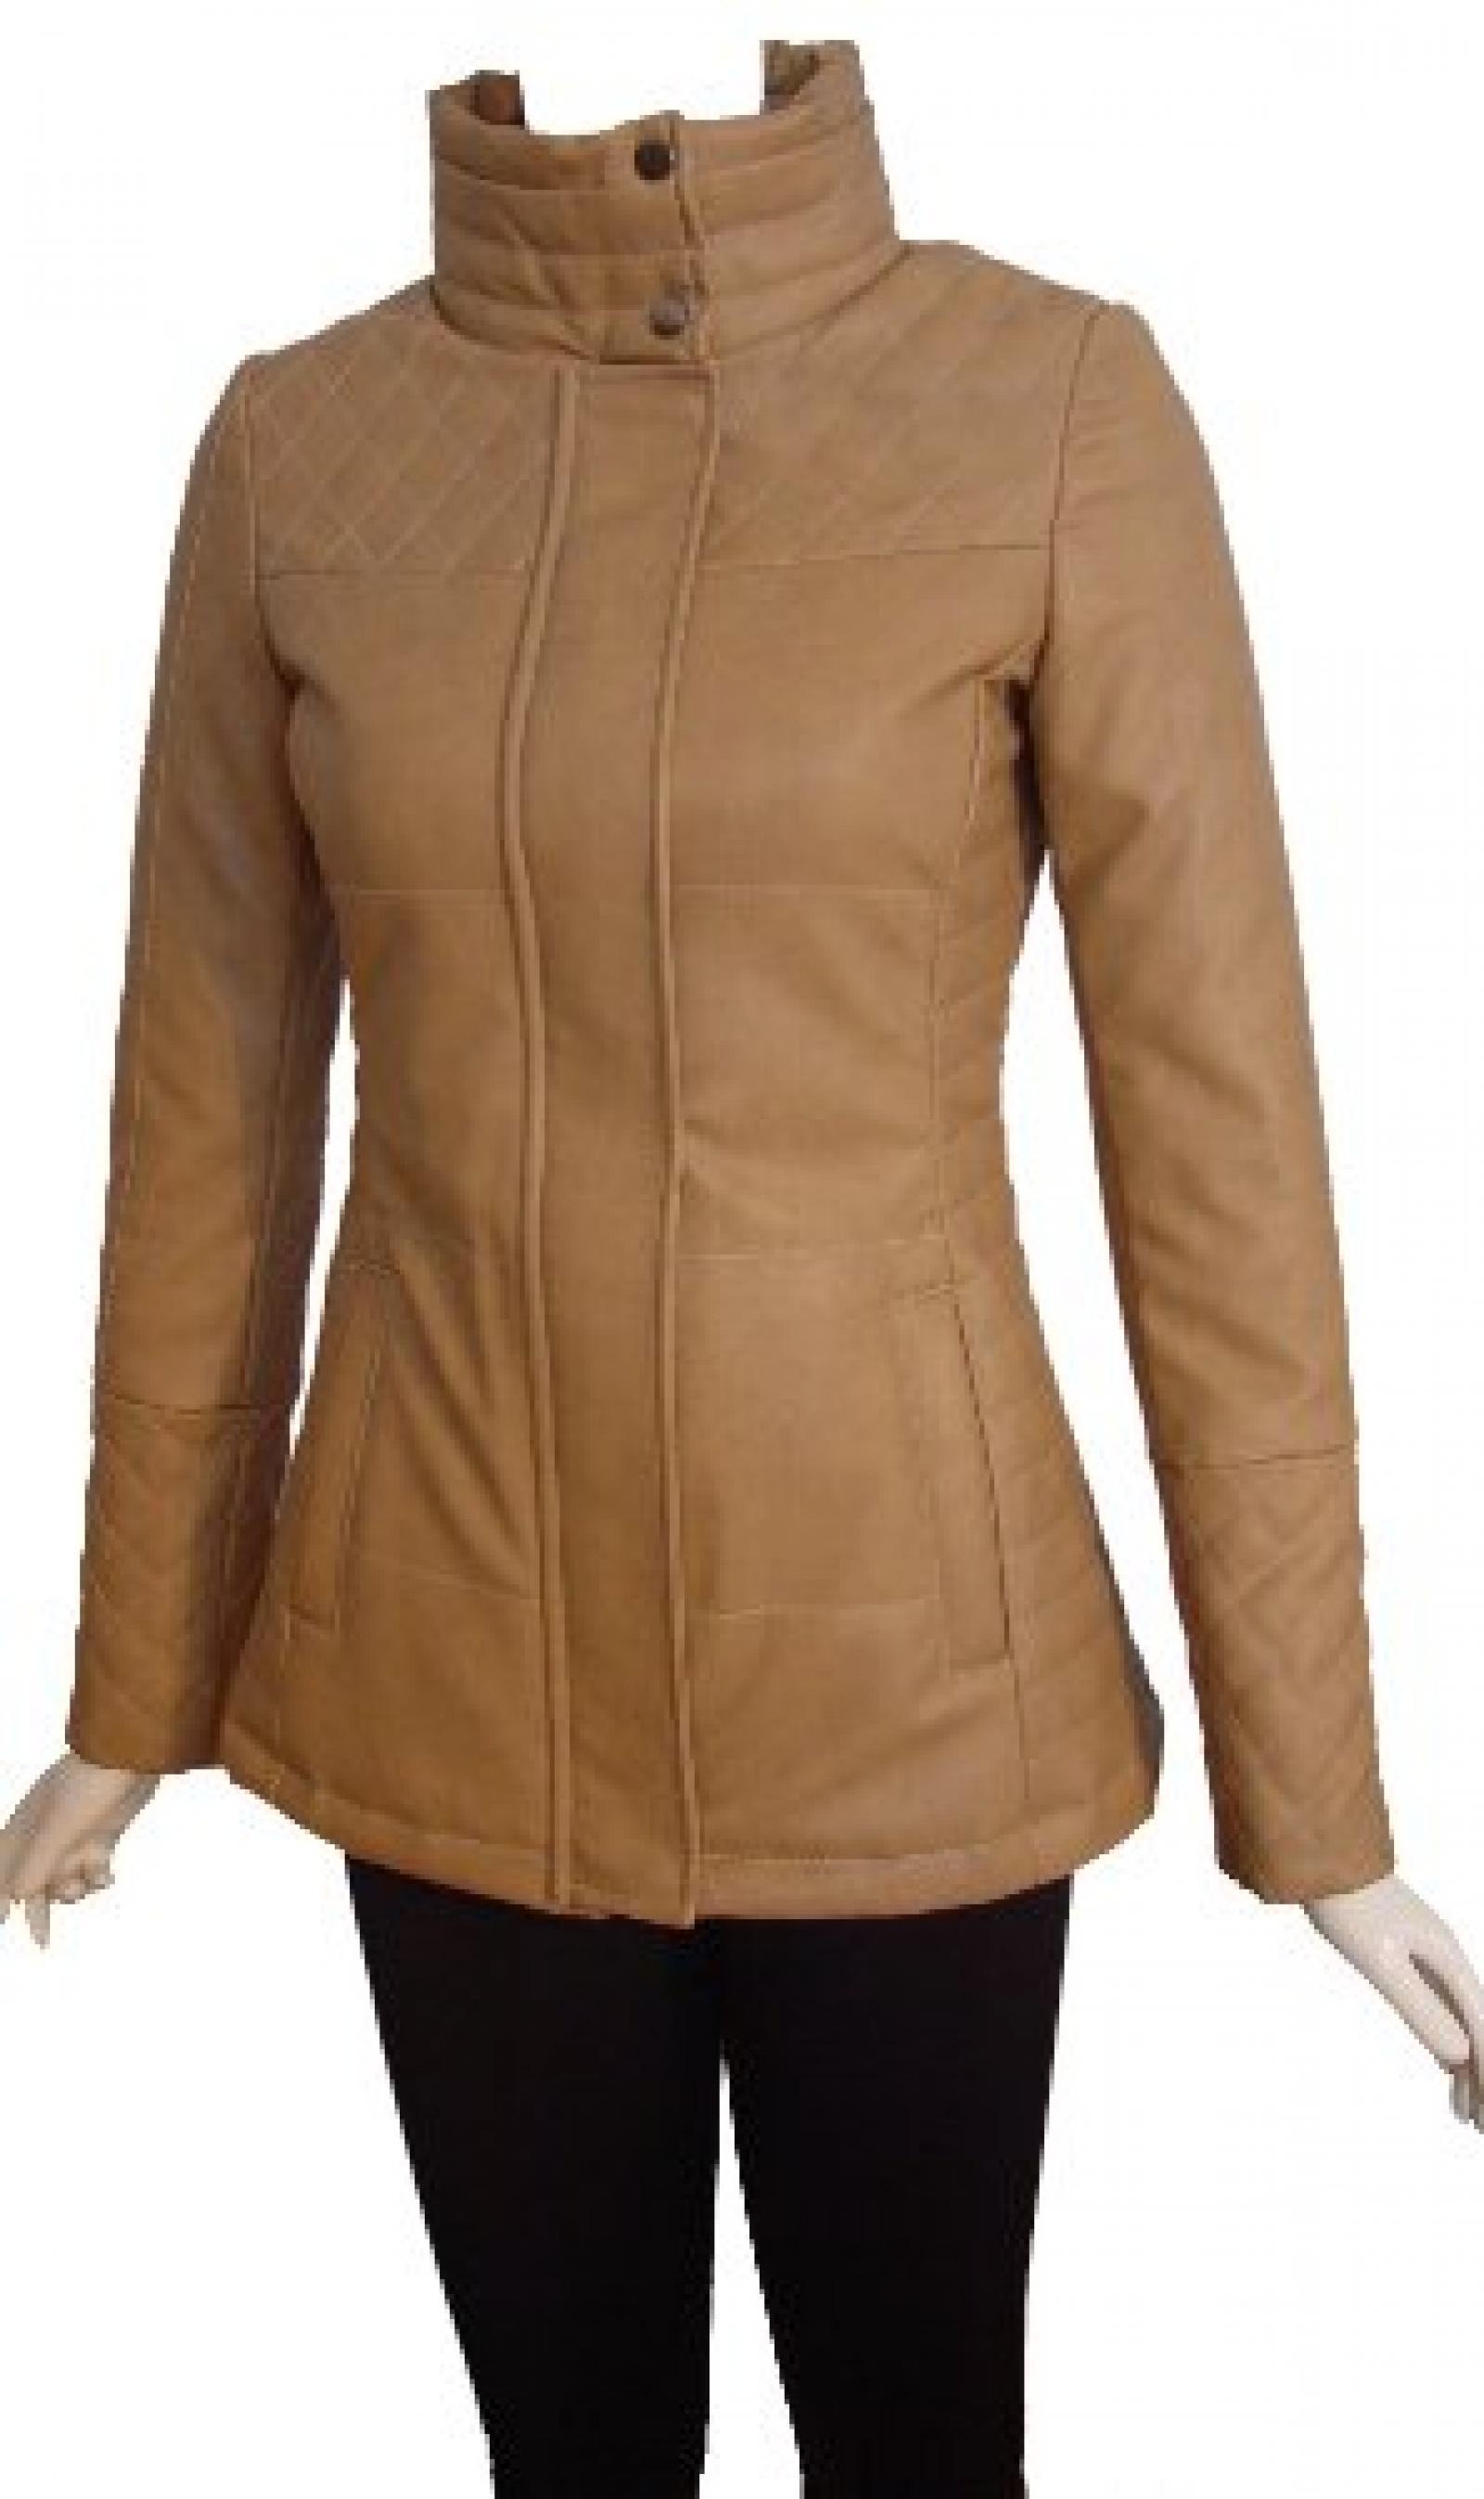 Nettailor Women 4204 Leather Casual Jacket Placket Zip Front Welt Pocket Quilt